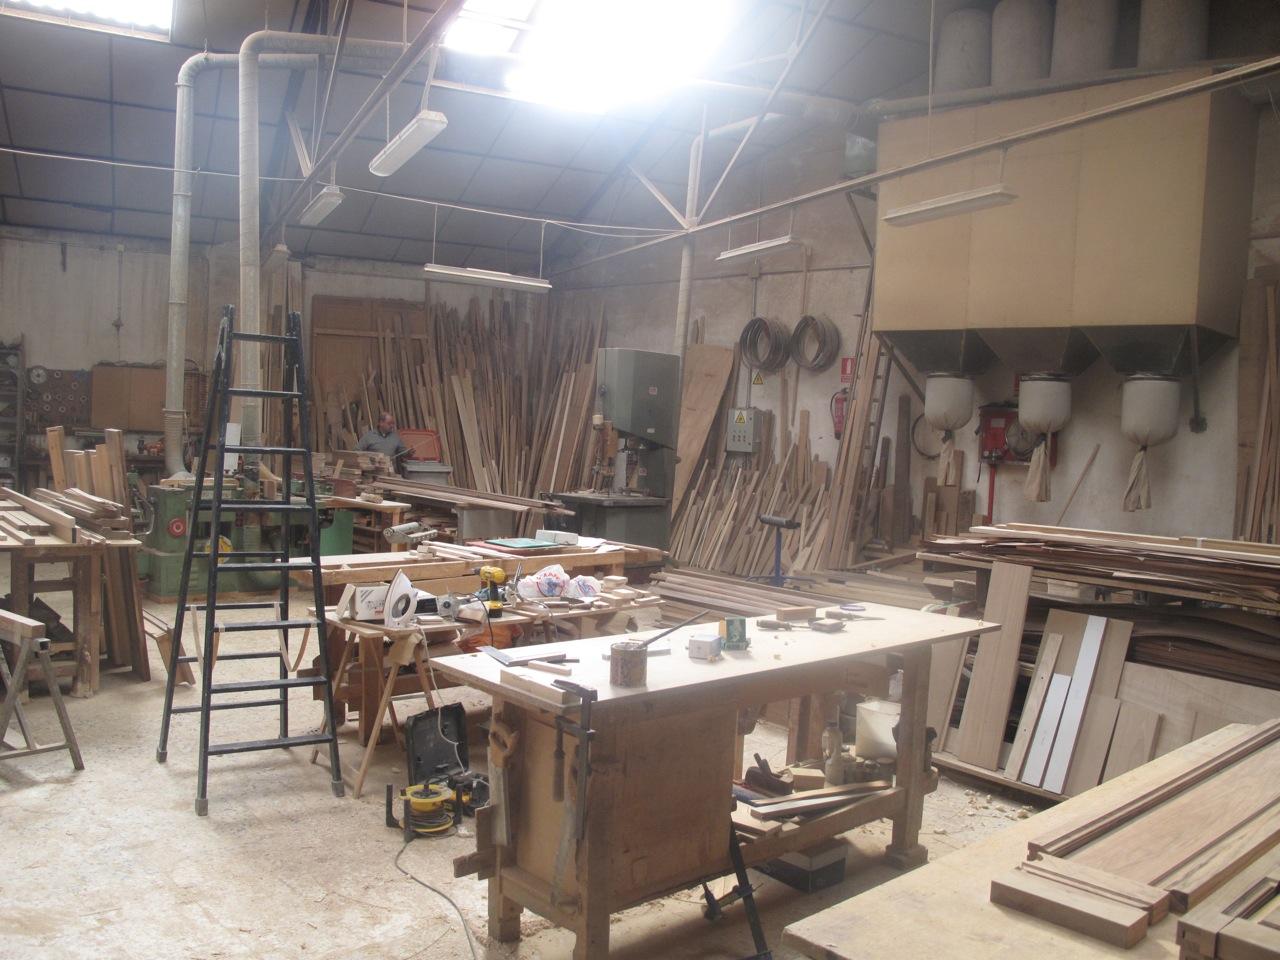 Daniel paya dise o de interiores arquitectura y decoraci n madrid blog visita al taller - Taller de ebanisteria ...